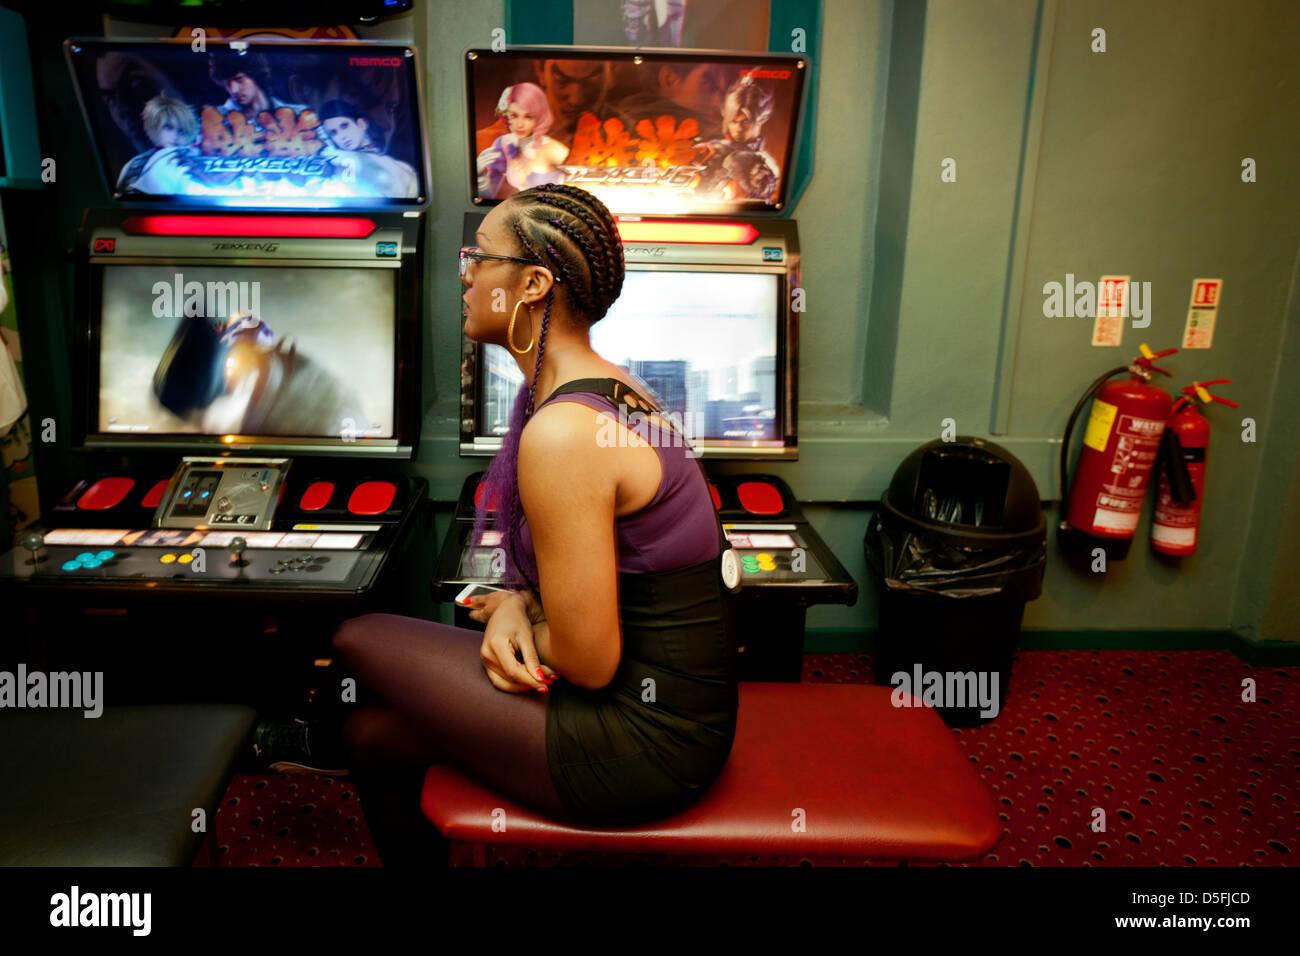 Arcade Games in Soho London - Stock Image